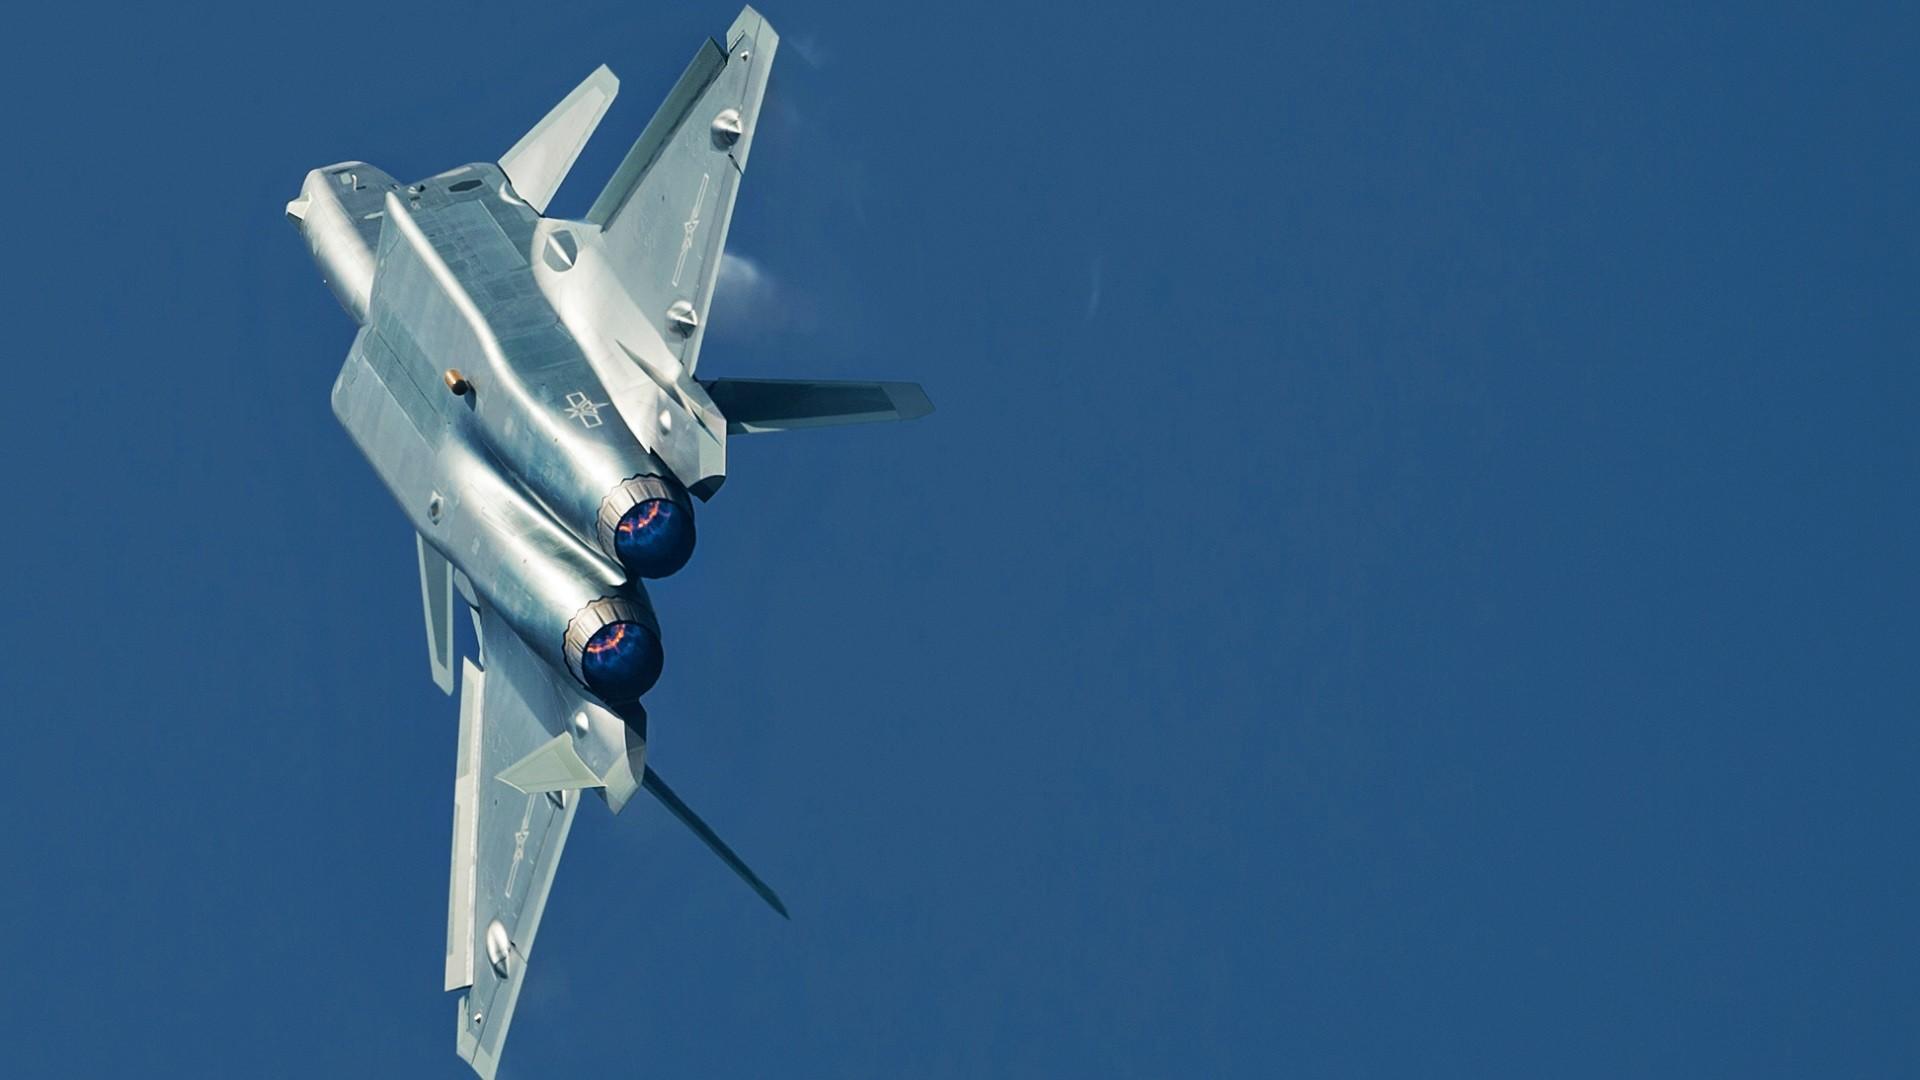 Wallpaper : vehicle, airplane, military aircraft, PLAAF, j20, Sukhoi